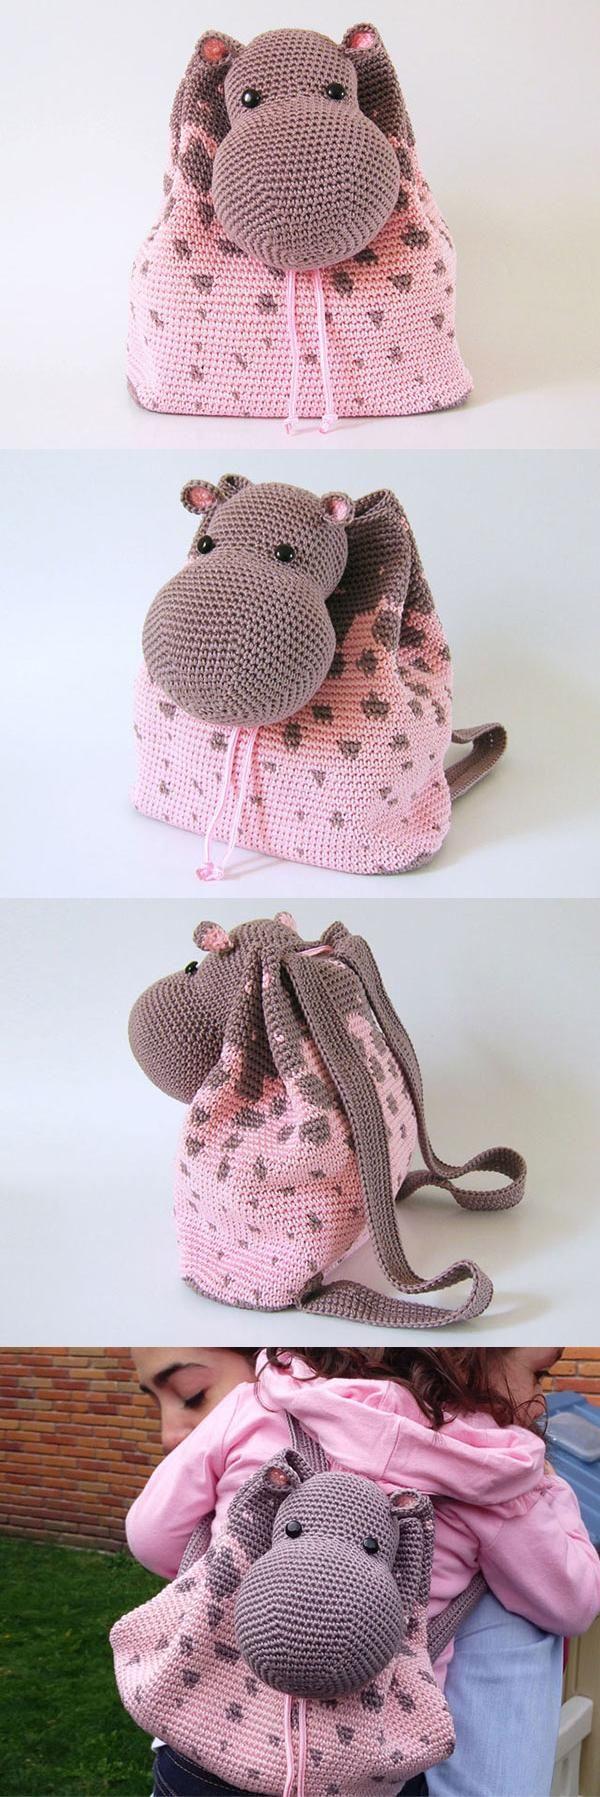 Hippo Backpack crochet pattern by Chabepatterns | Mochilas ...